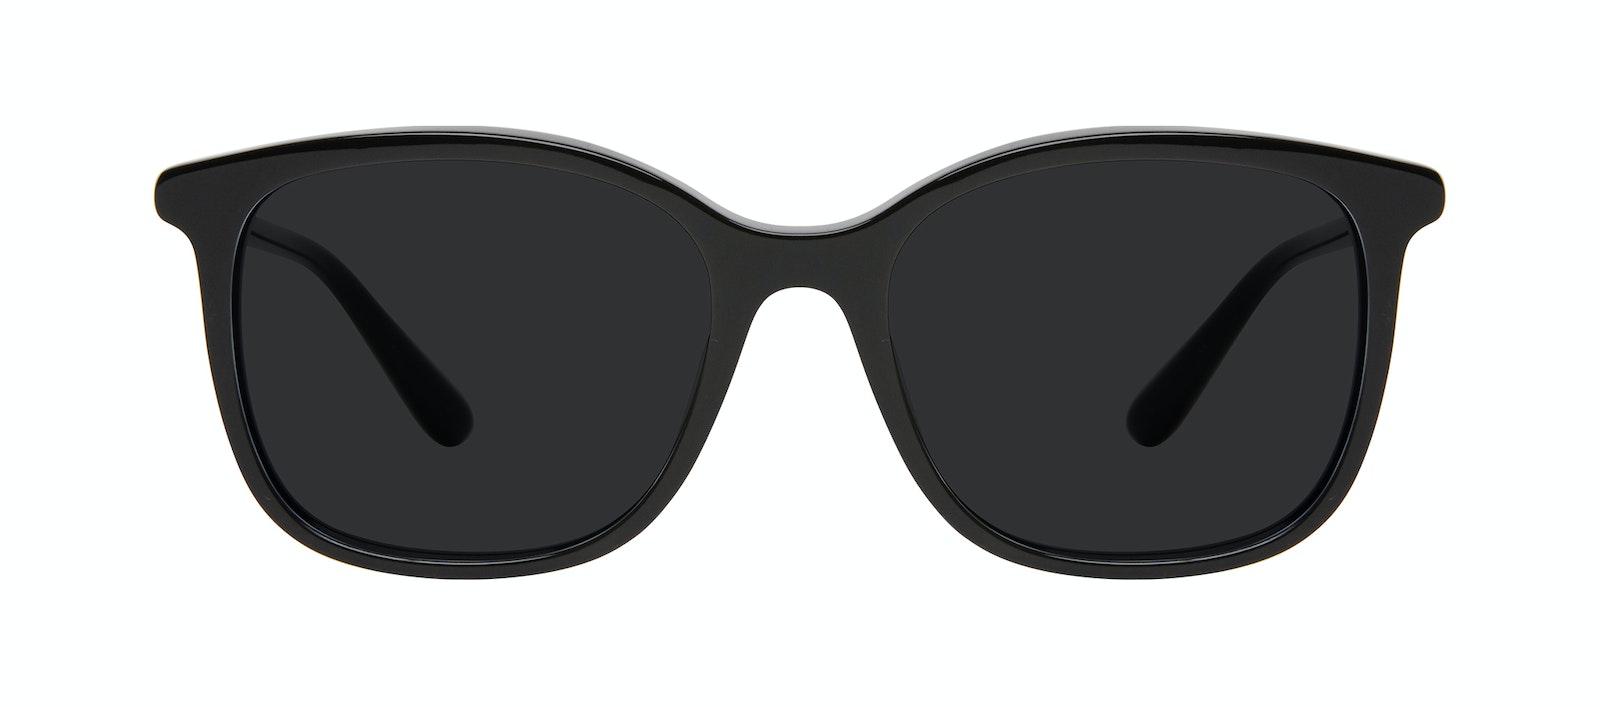 Affordable Fashion Glasses Square Sunglasses Women Luna Onyx Front